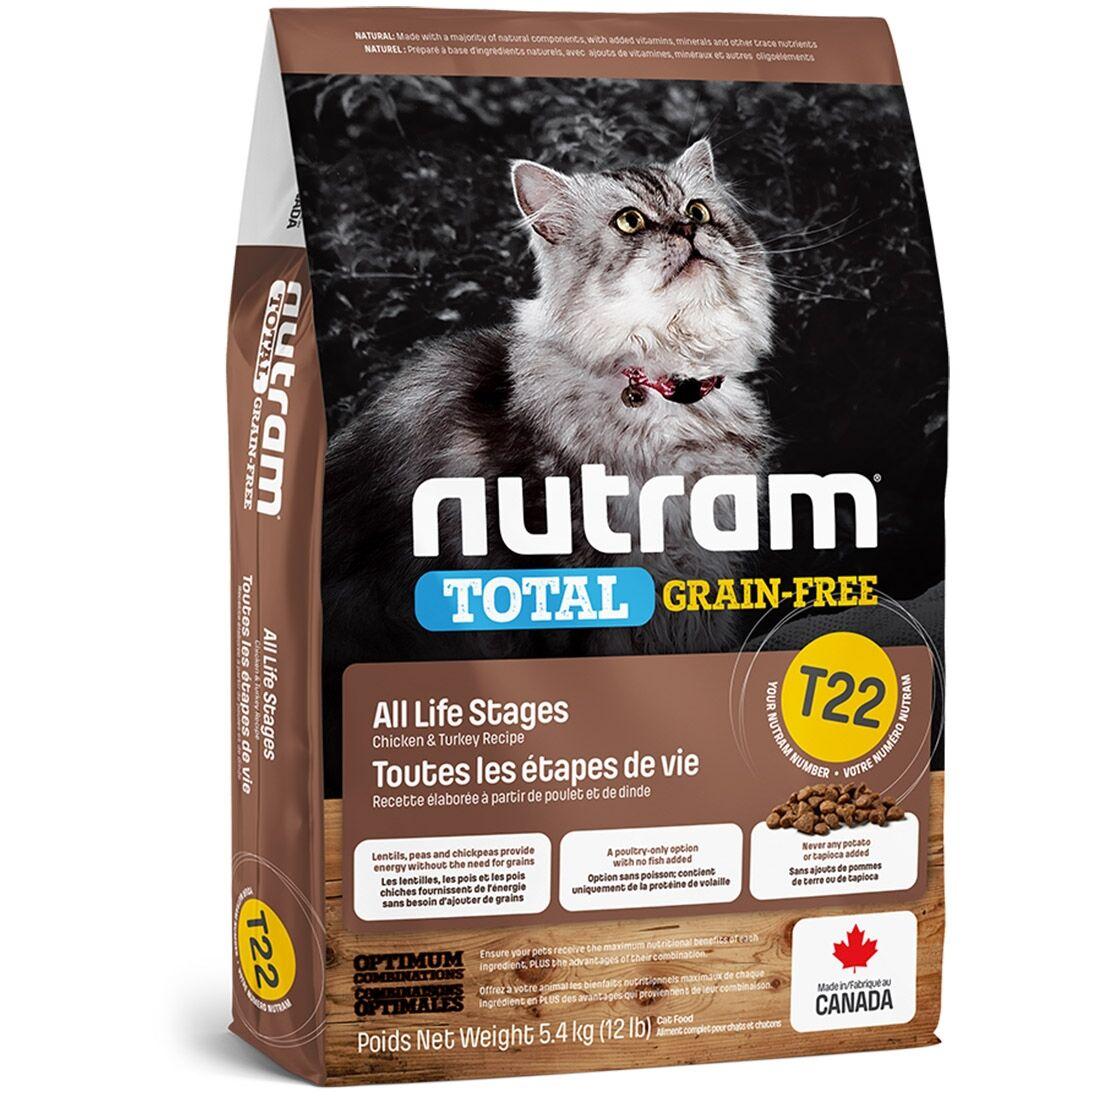 Nutram Croquettes chat Nutram Total Grain-Free T22 Turkey, Chicken & Duck Contenance : 1,13 kg